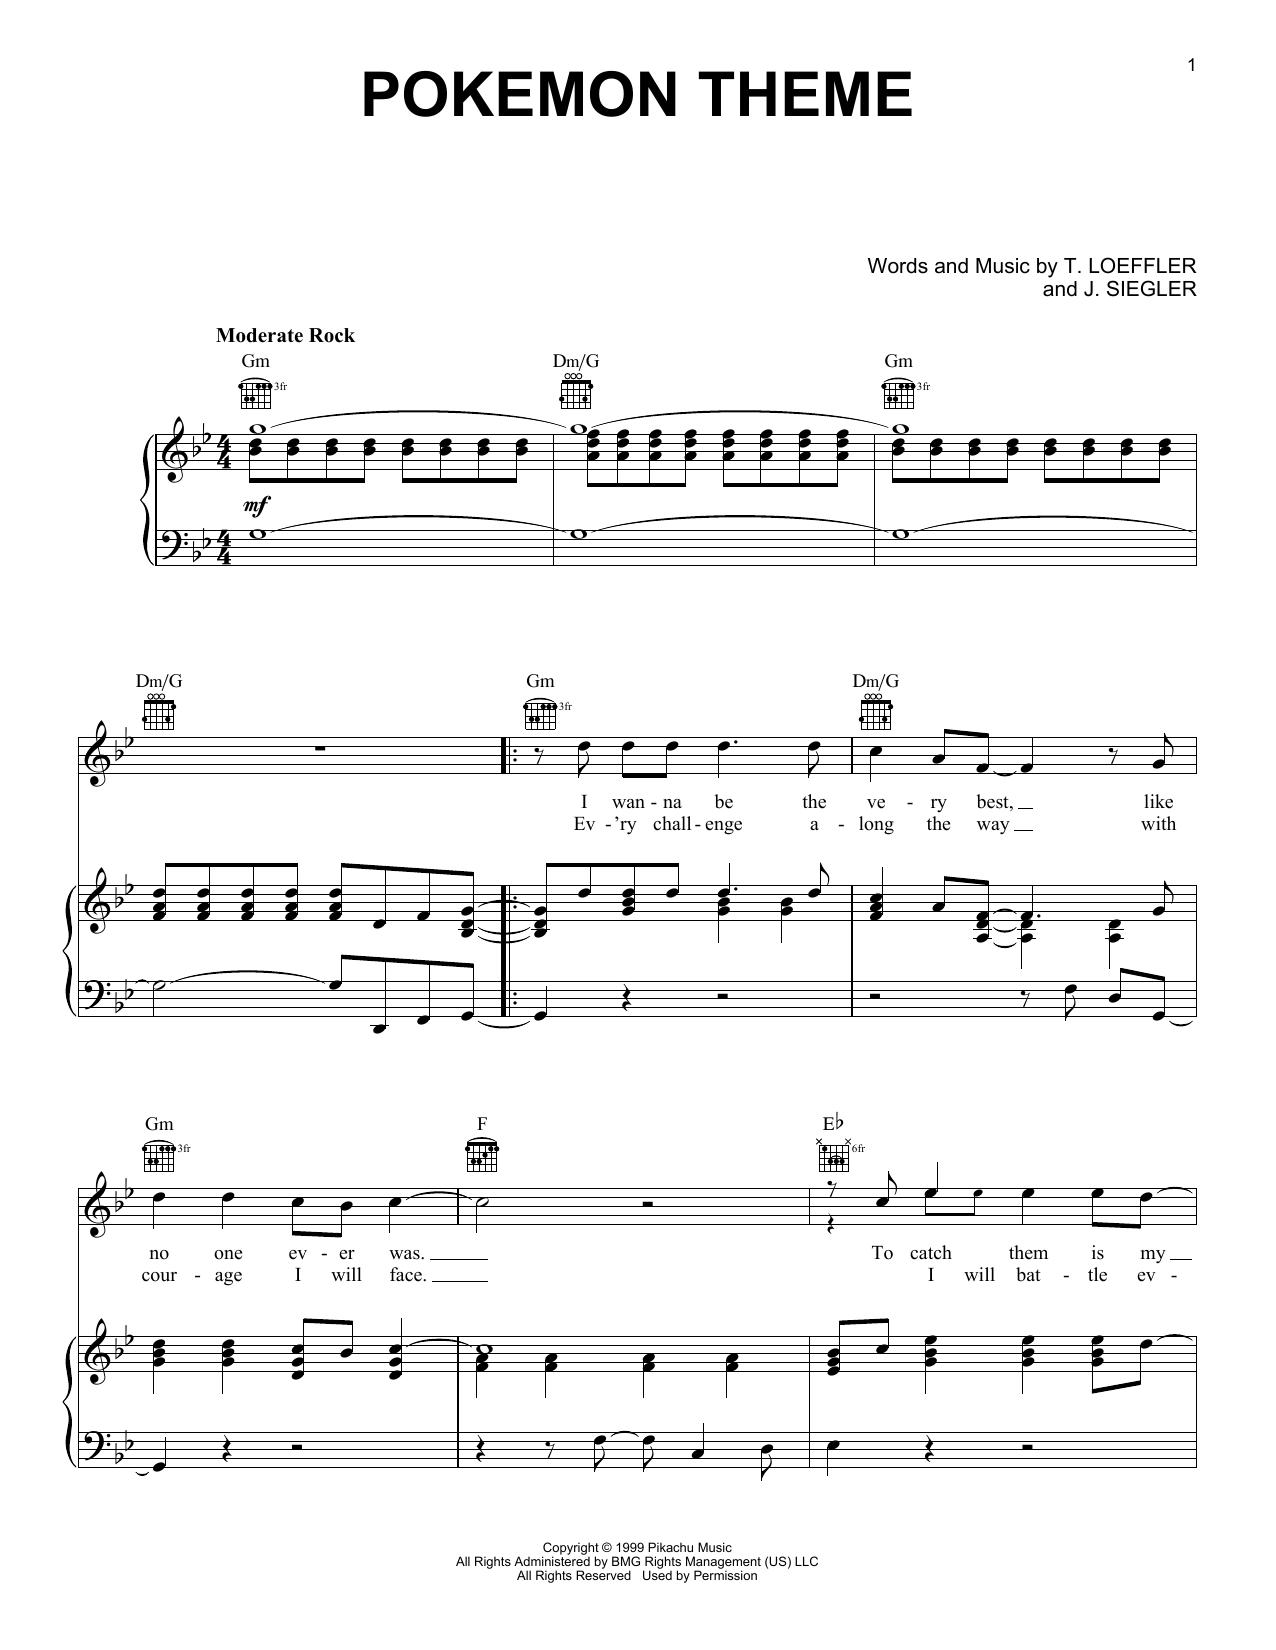 J Siegler Pokemon Theme Sheet Music Notes Chords Printable Video